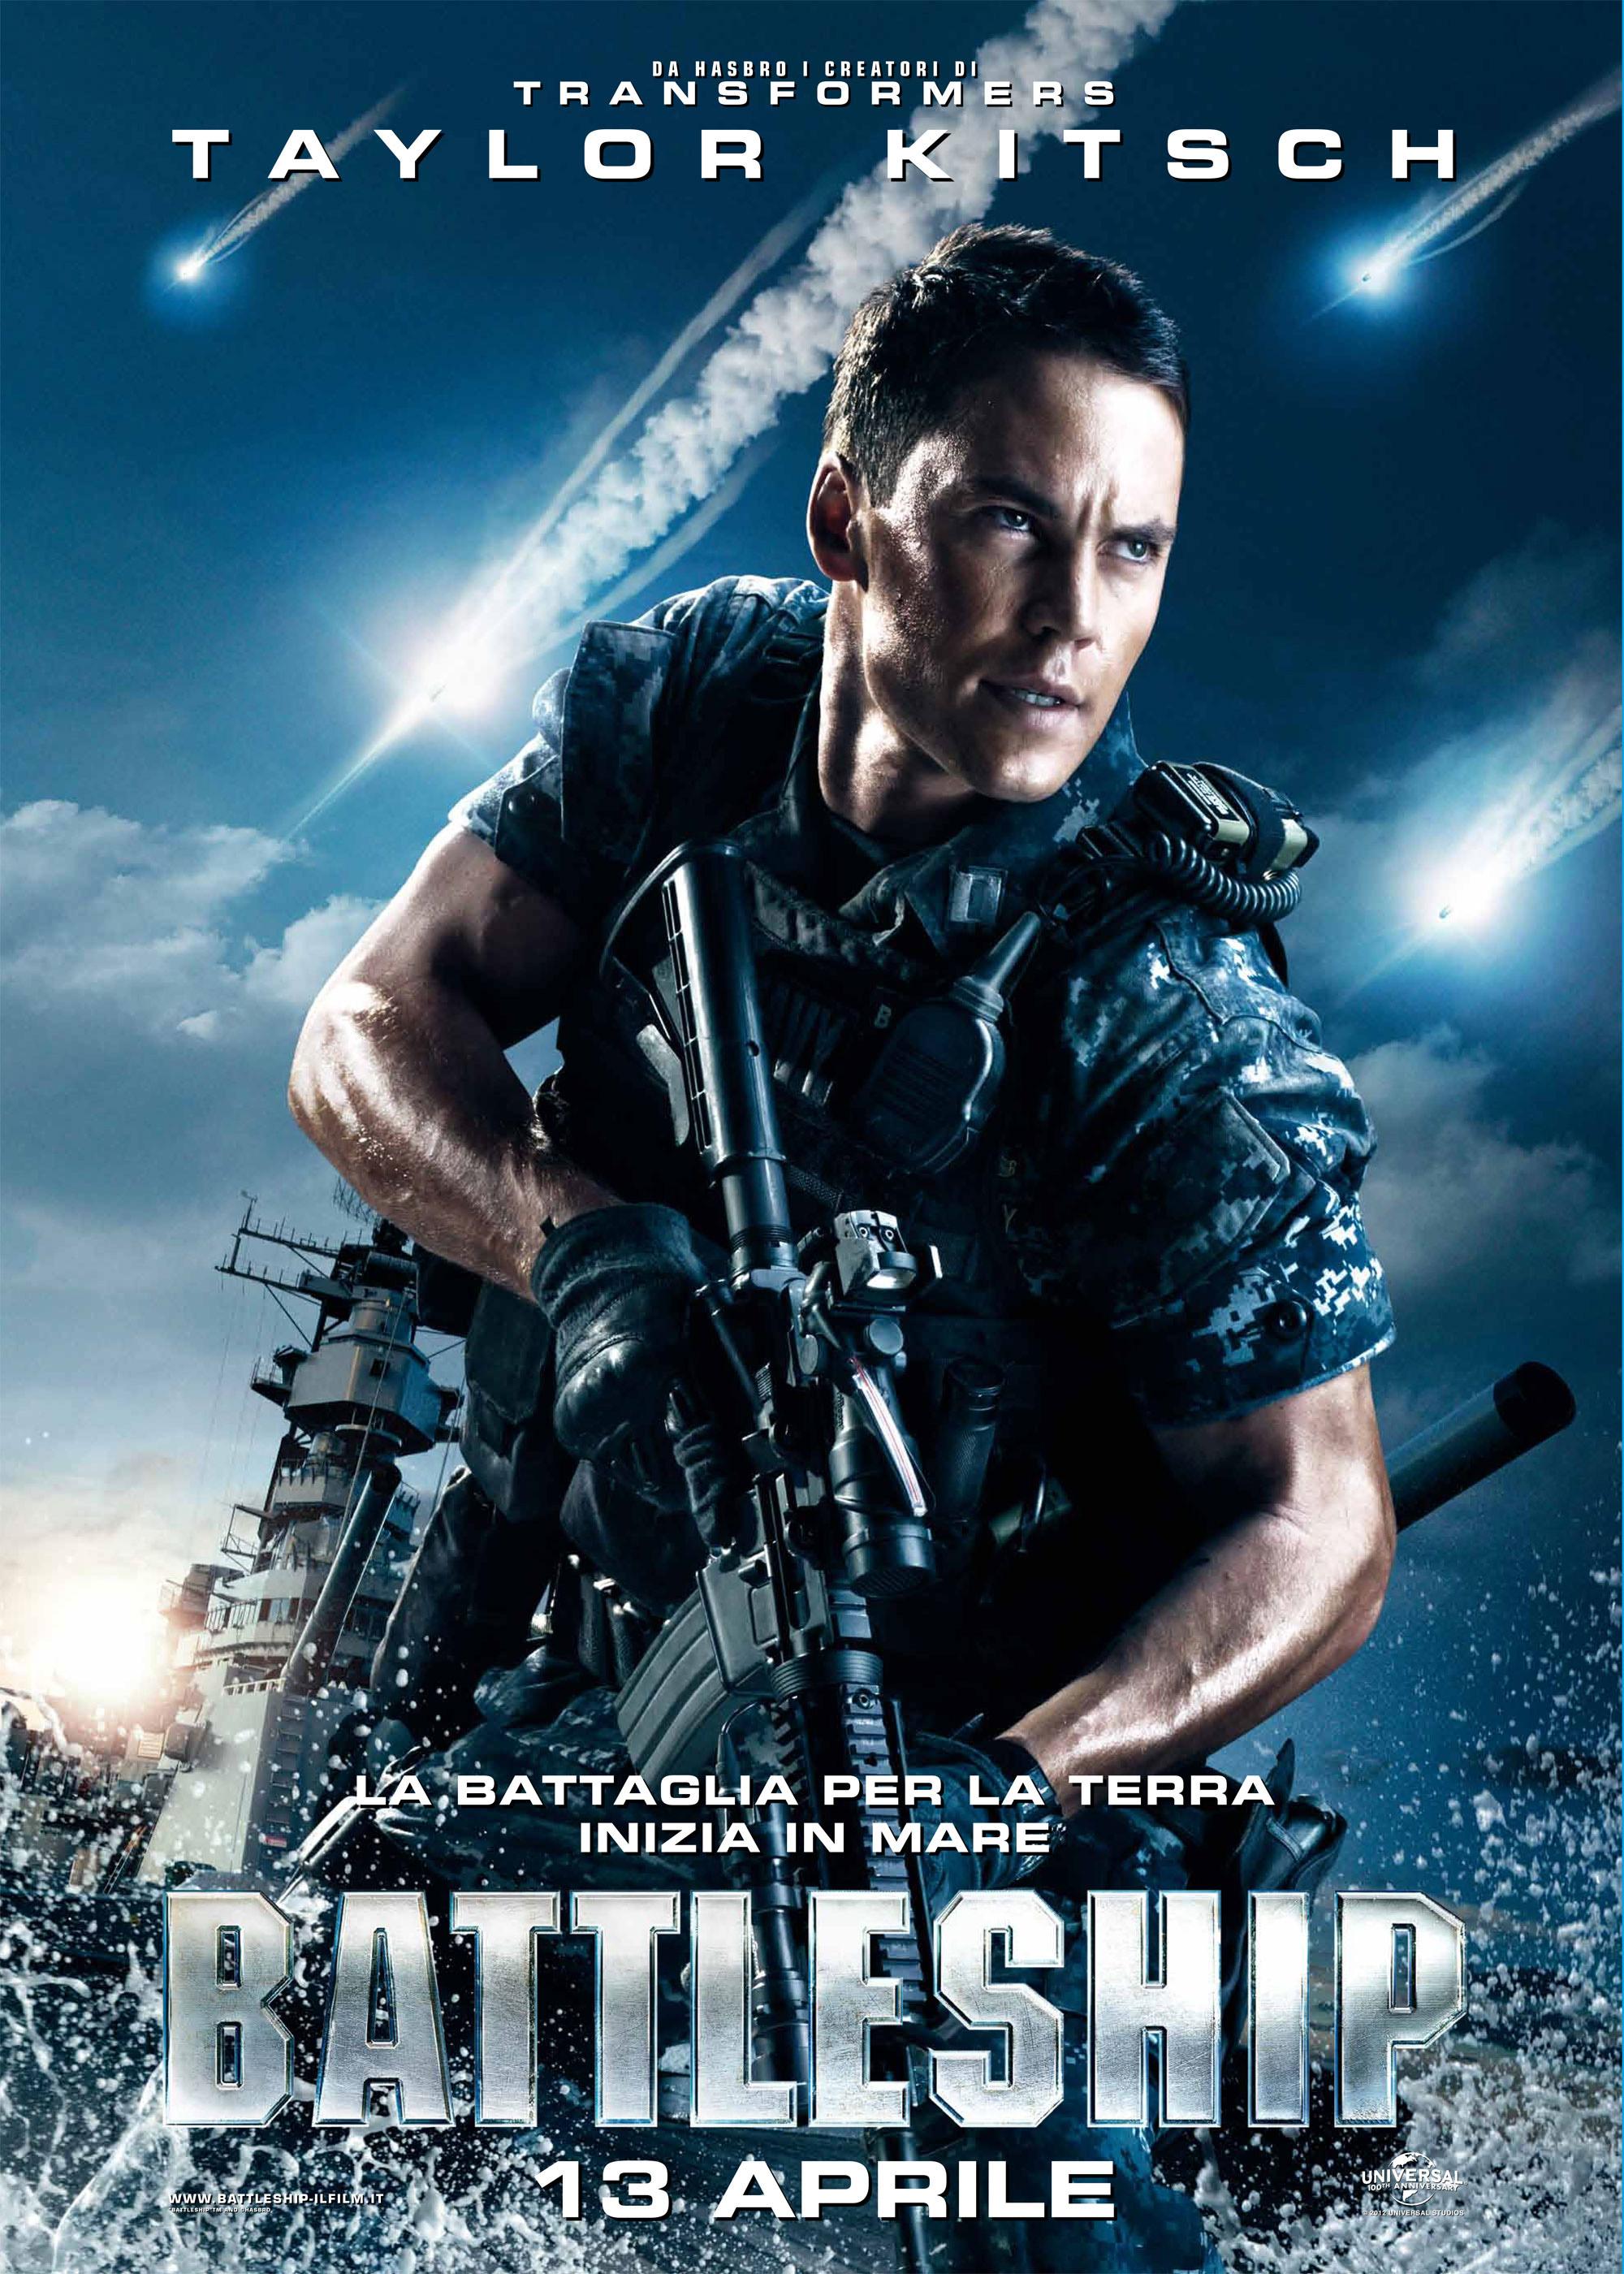 Battleship ยุทธการเรือรบพิฆาตฝูงเอเลี่ยน (2012) HD พากย์ไทย